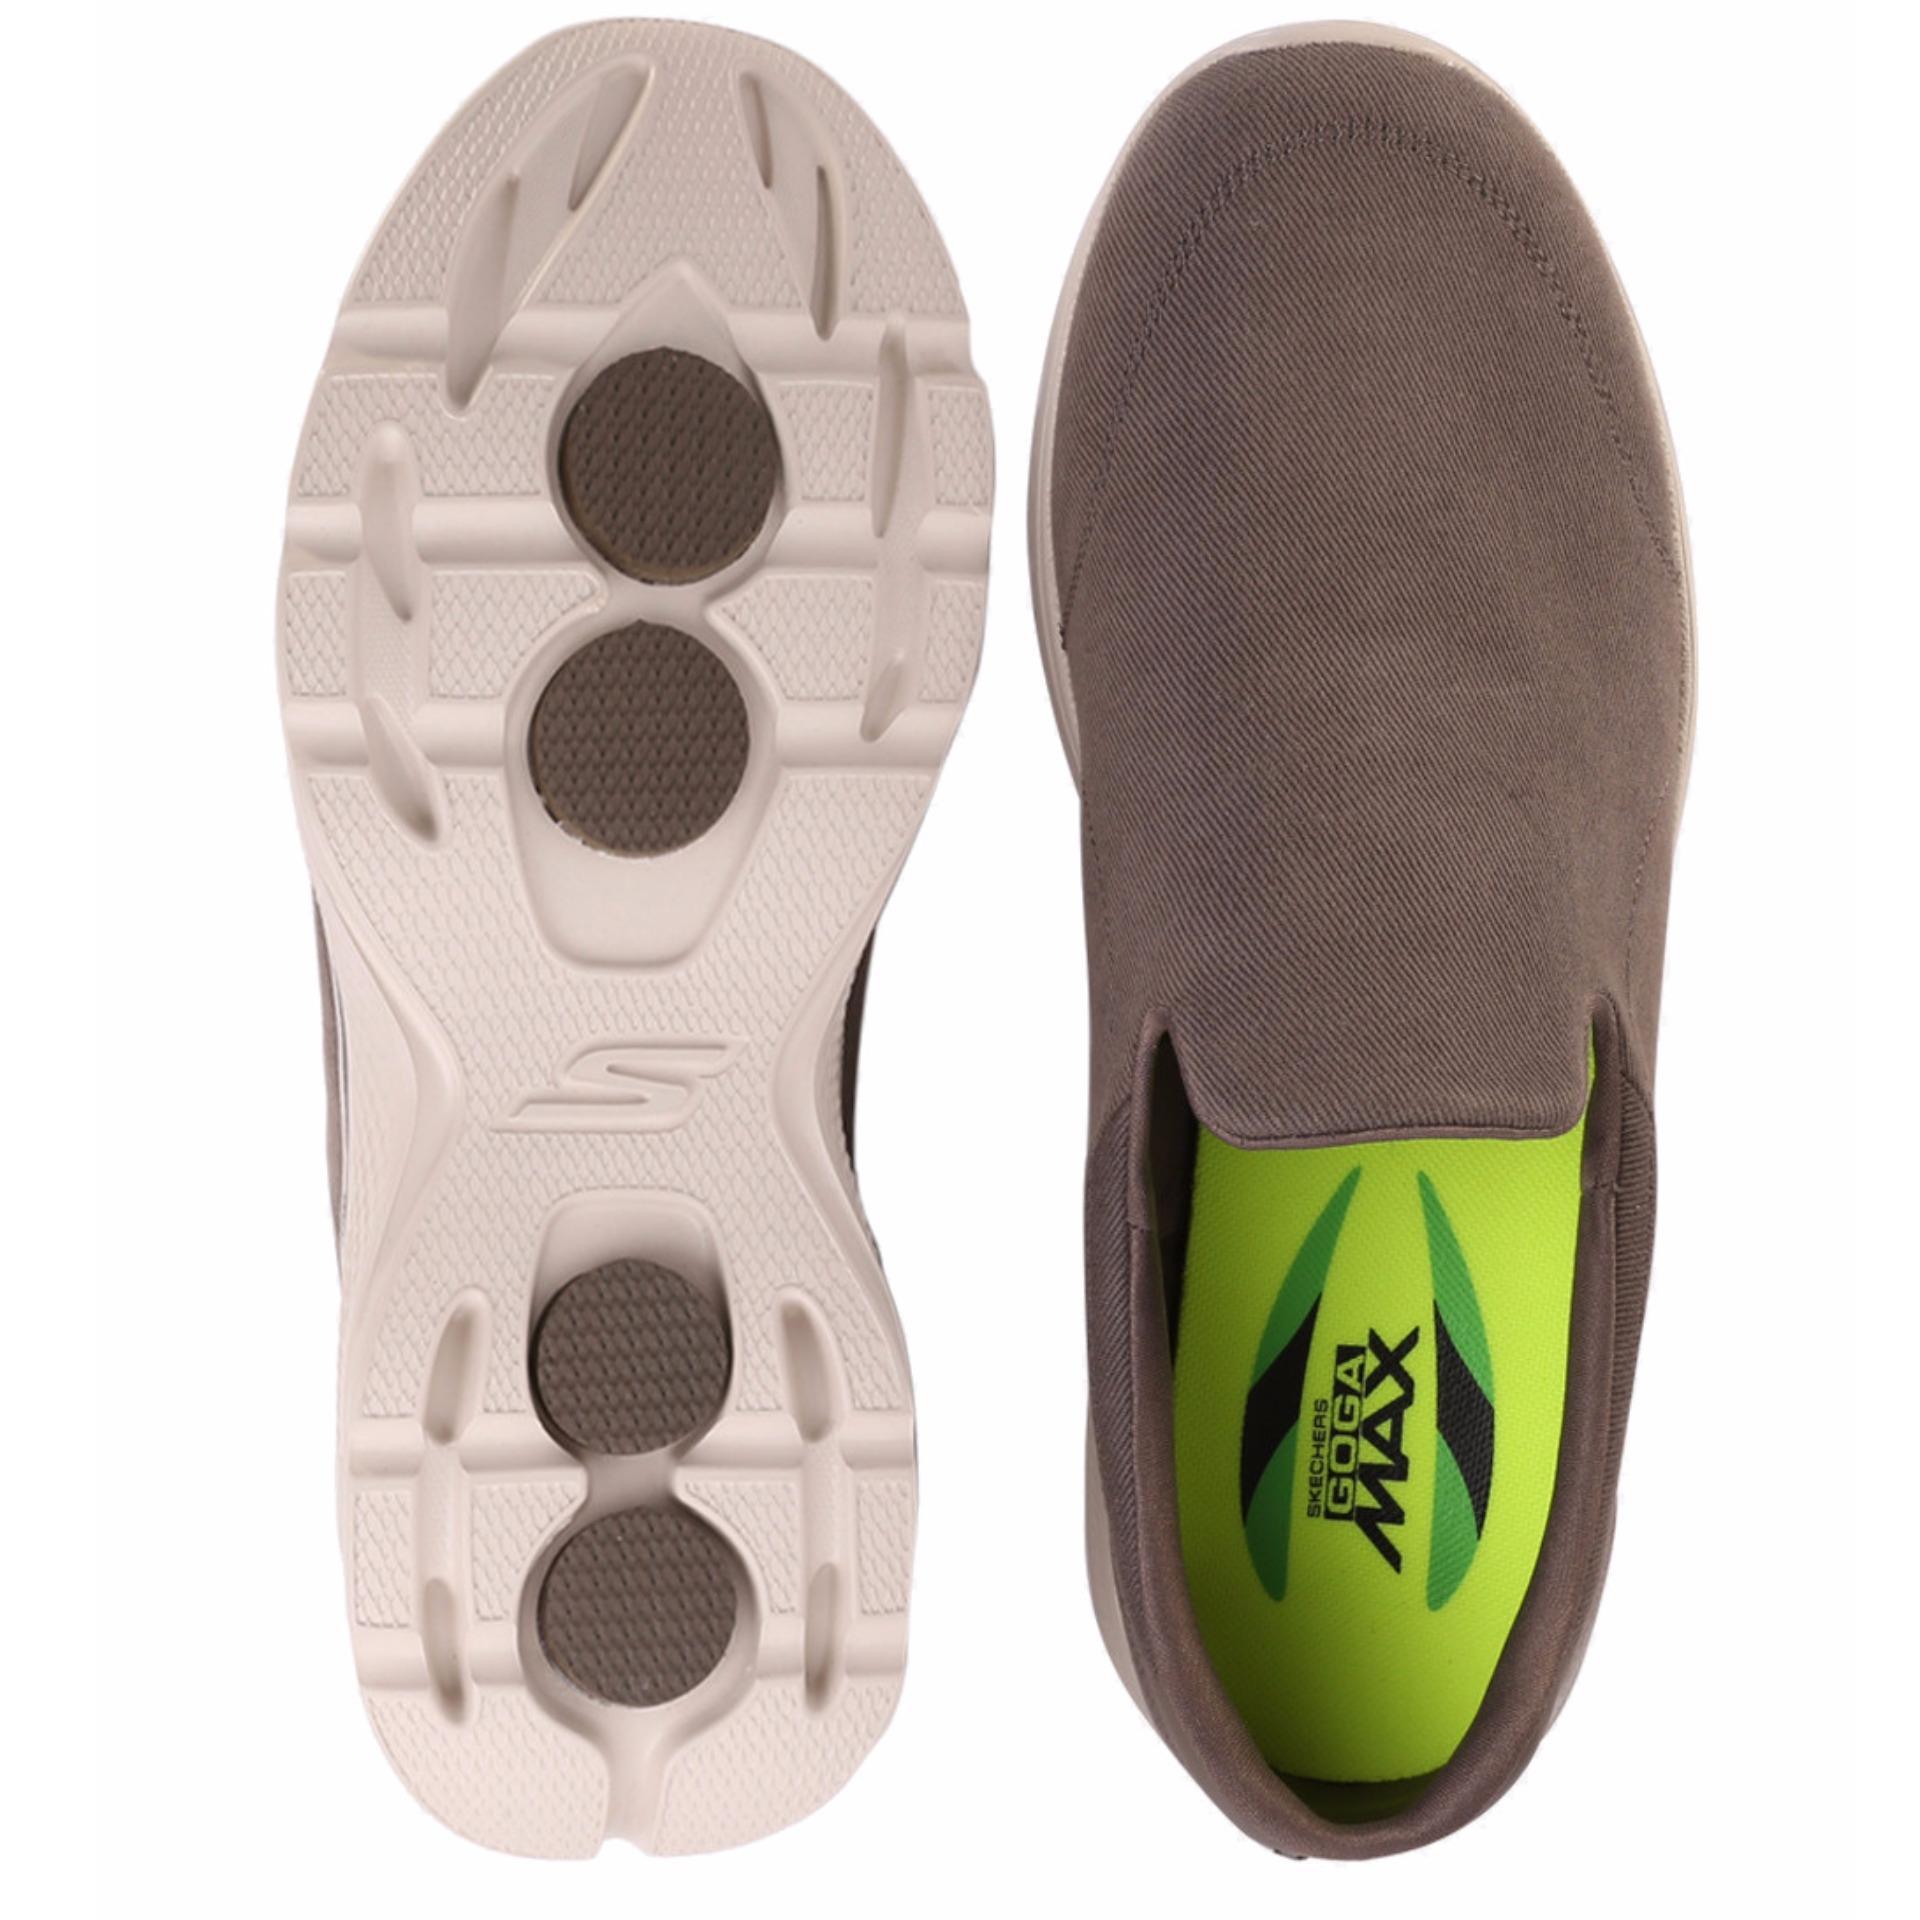 Skechers Go Walk 3 Men Beludru Sepatu Pria Caual - Daftar Harga ... 9f5b36e630